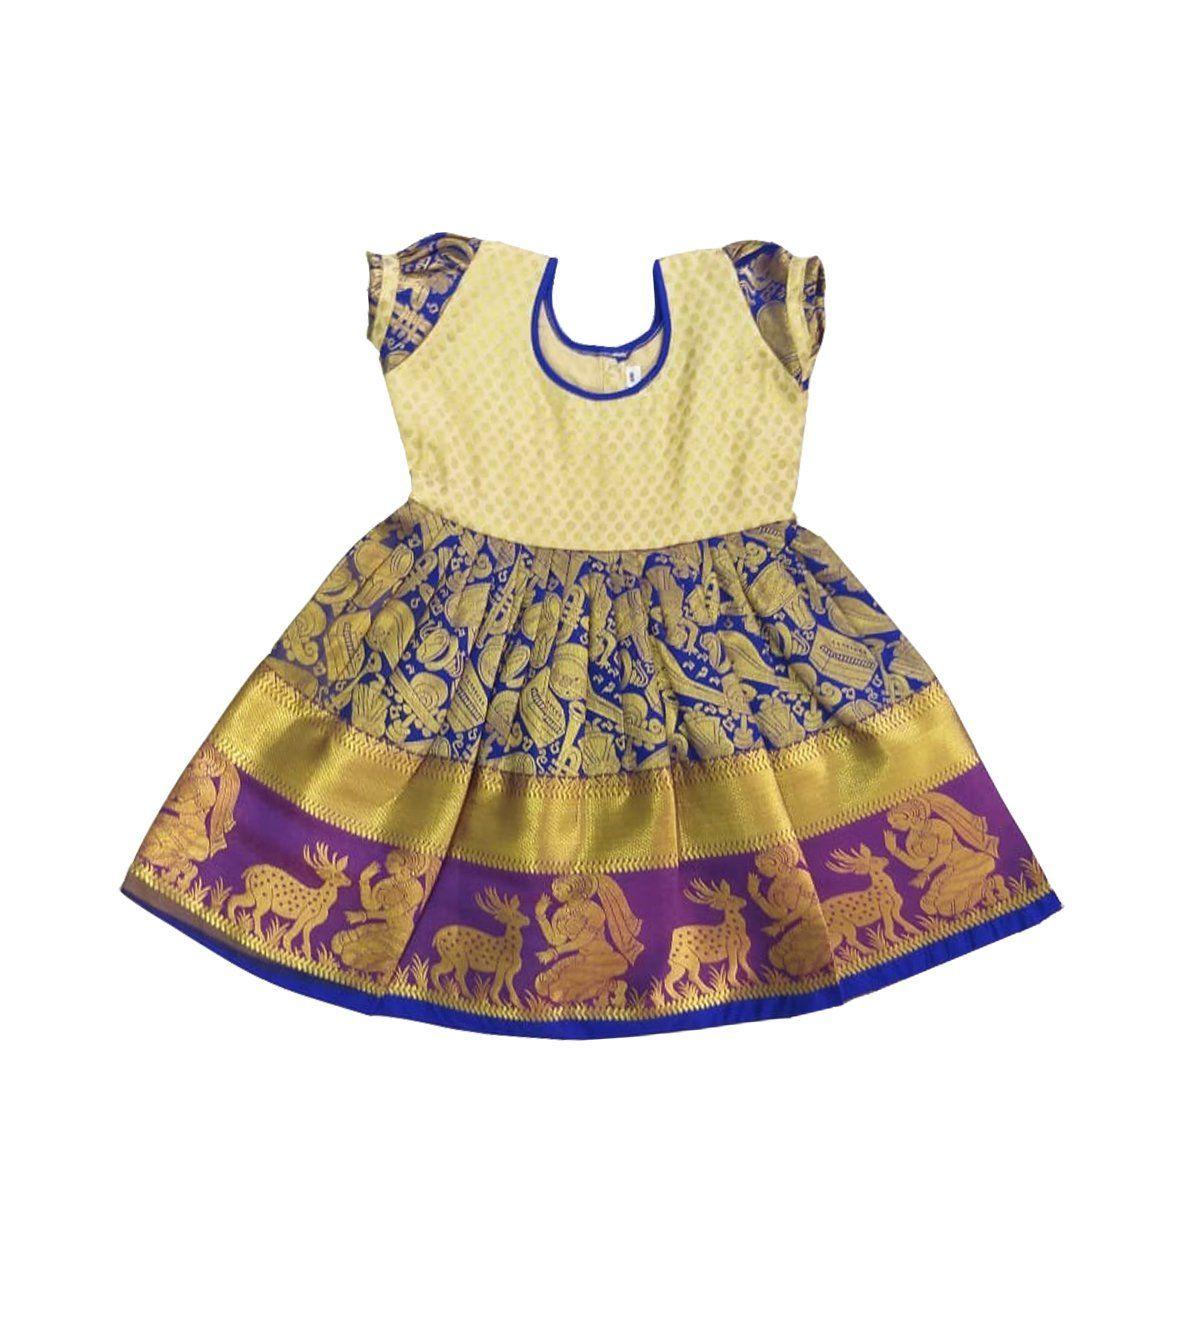 2327f7d0ce Pattu Pavadai New Born Babies Pure Silk Frock (Blue and Cream; 6 Months-2  Years) #pattupavadai #lehengacholi #kidsdress #childrendress #babygirldress  ...